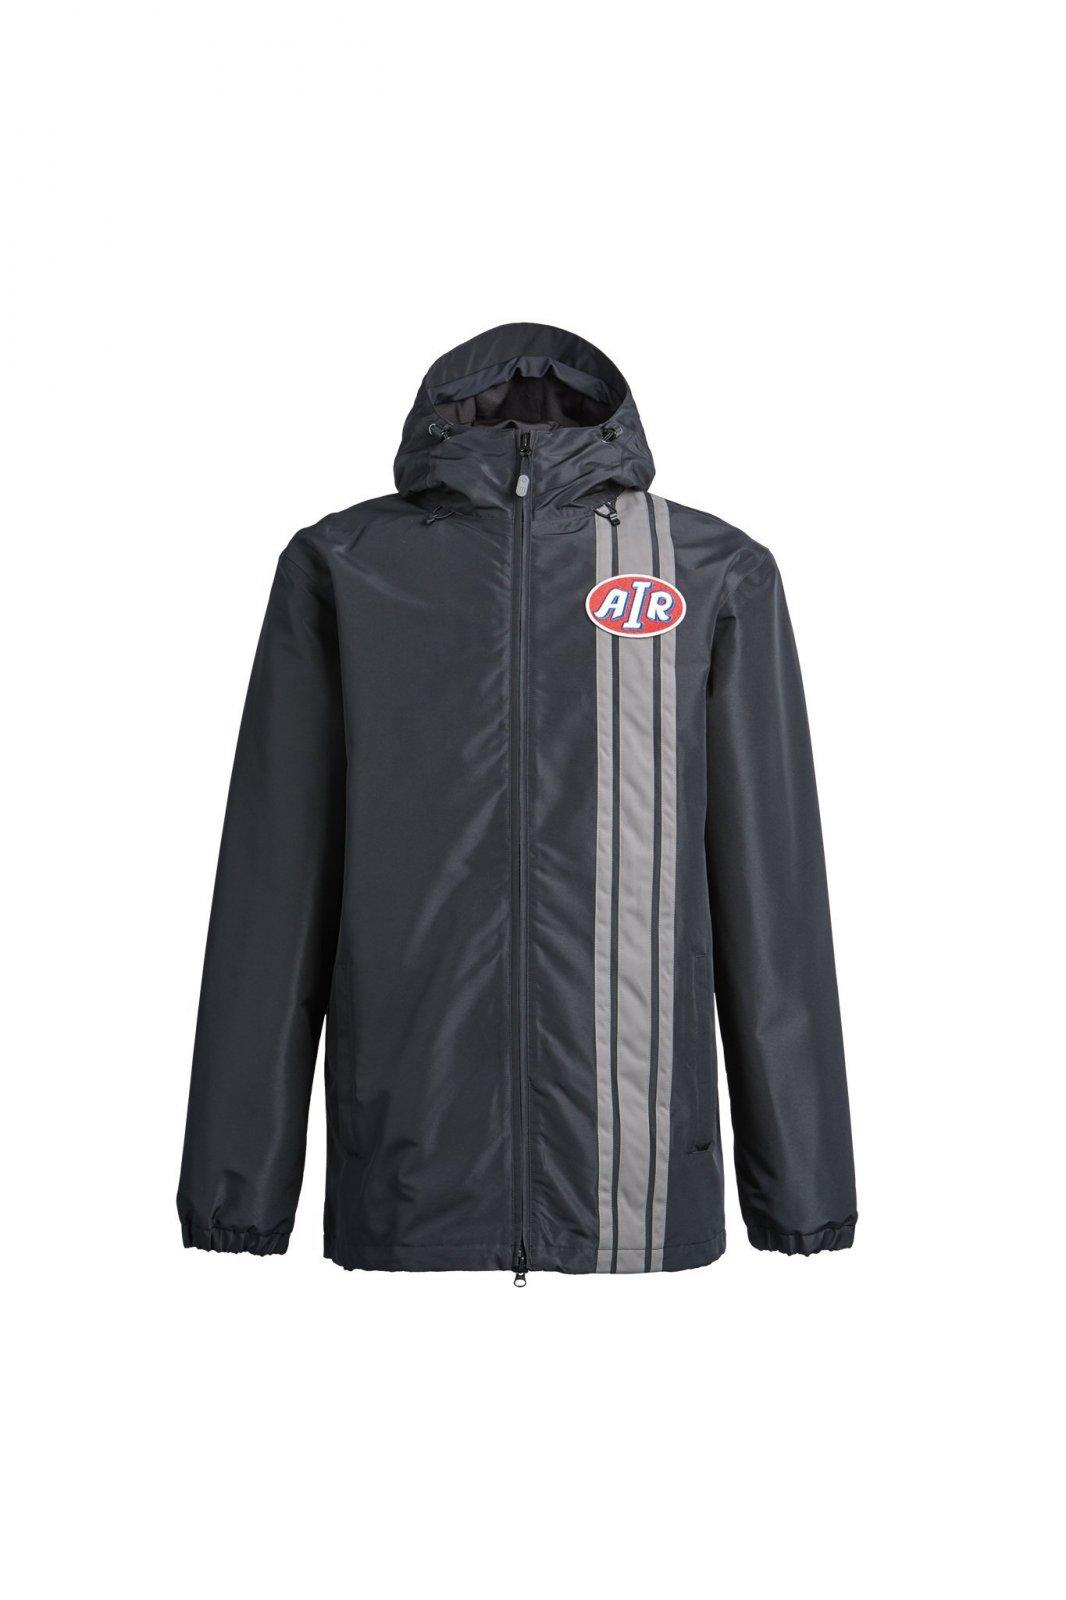 Airblaster Revert Snowboard Jacket (Multiple Color Options)